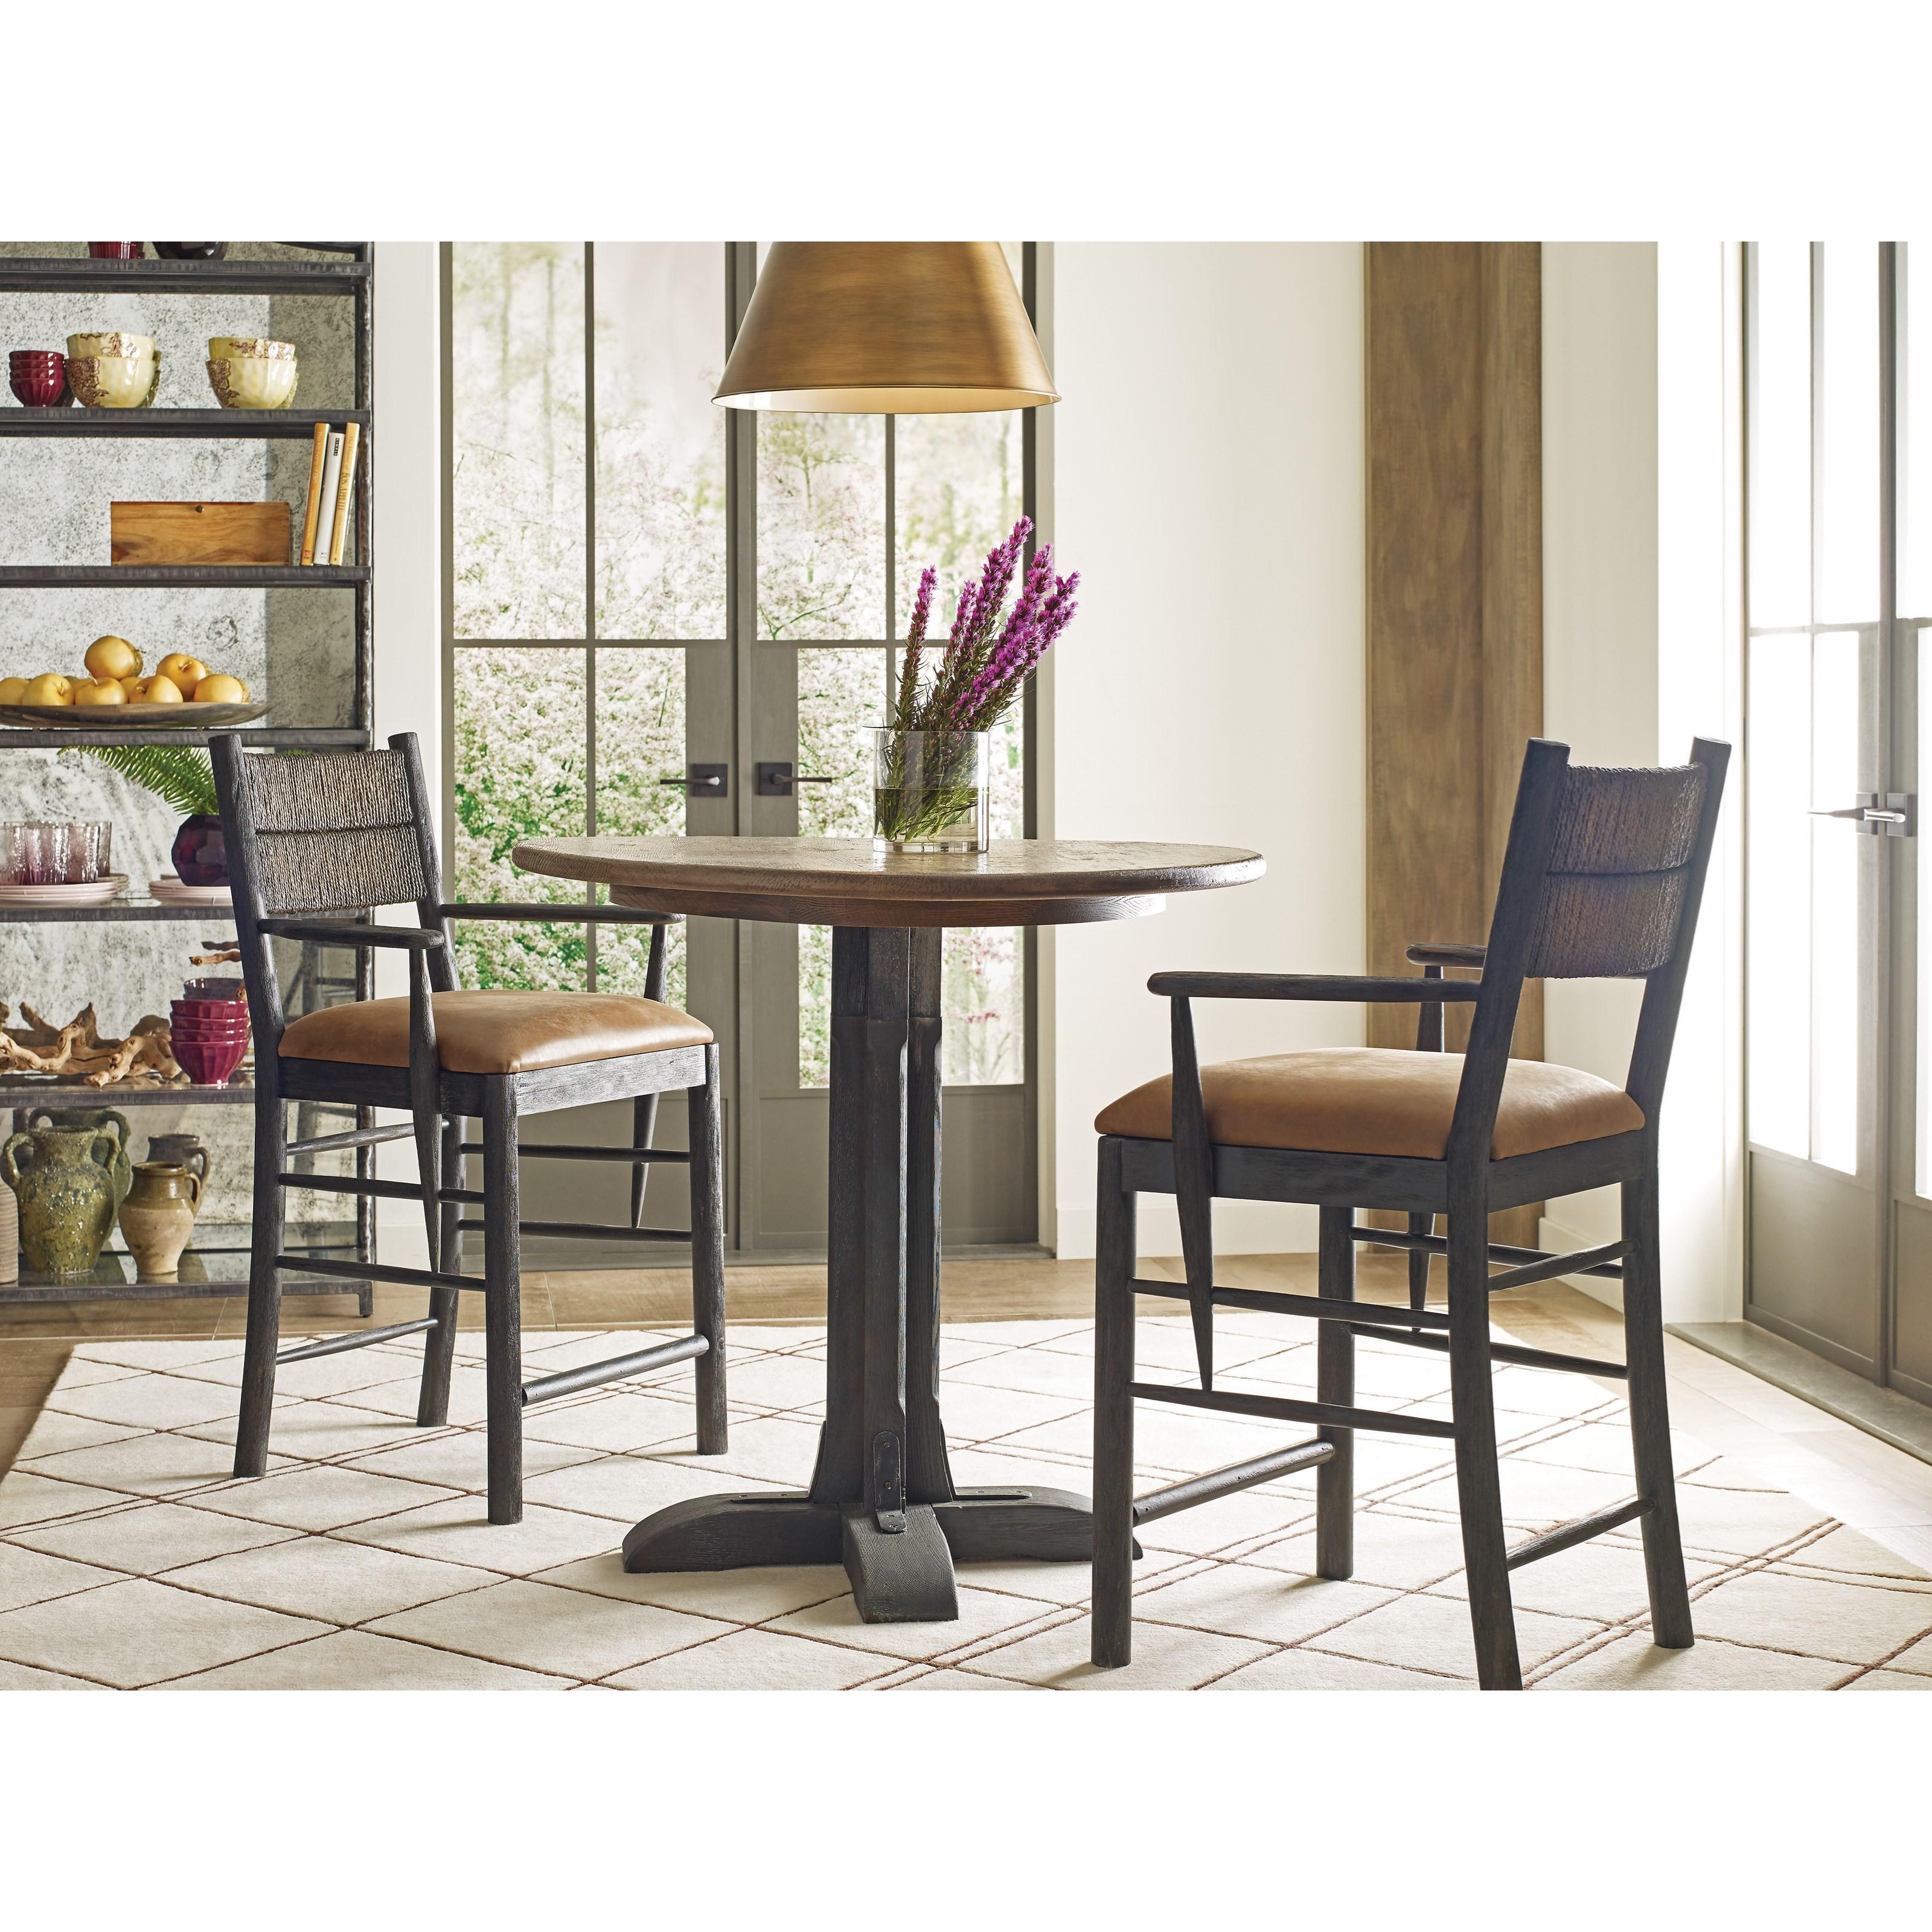 Kincaid Furniture Trails Three Piece Dining Set   Item Number:  813 706H+2x691C